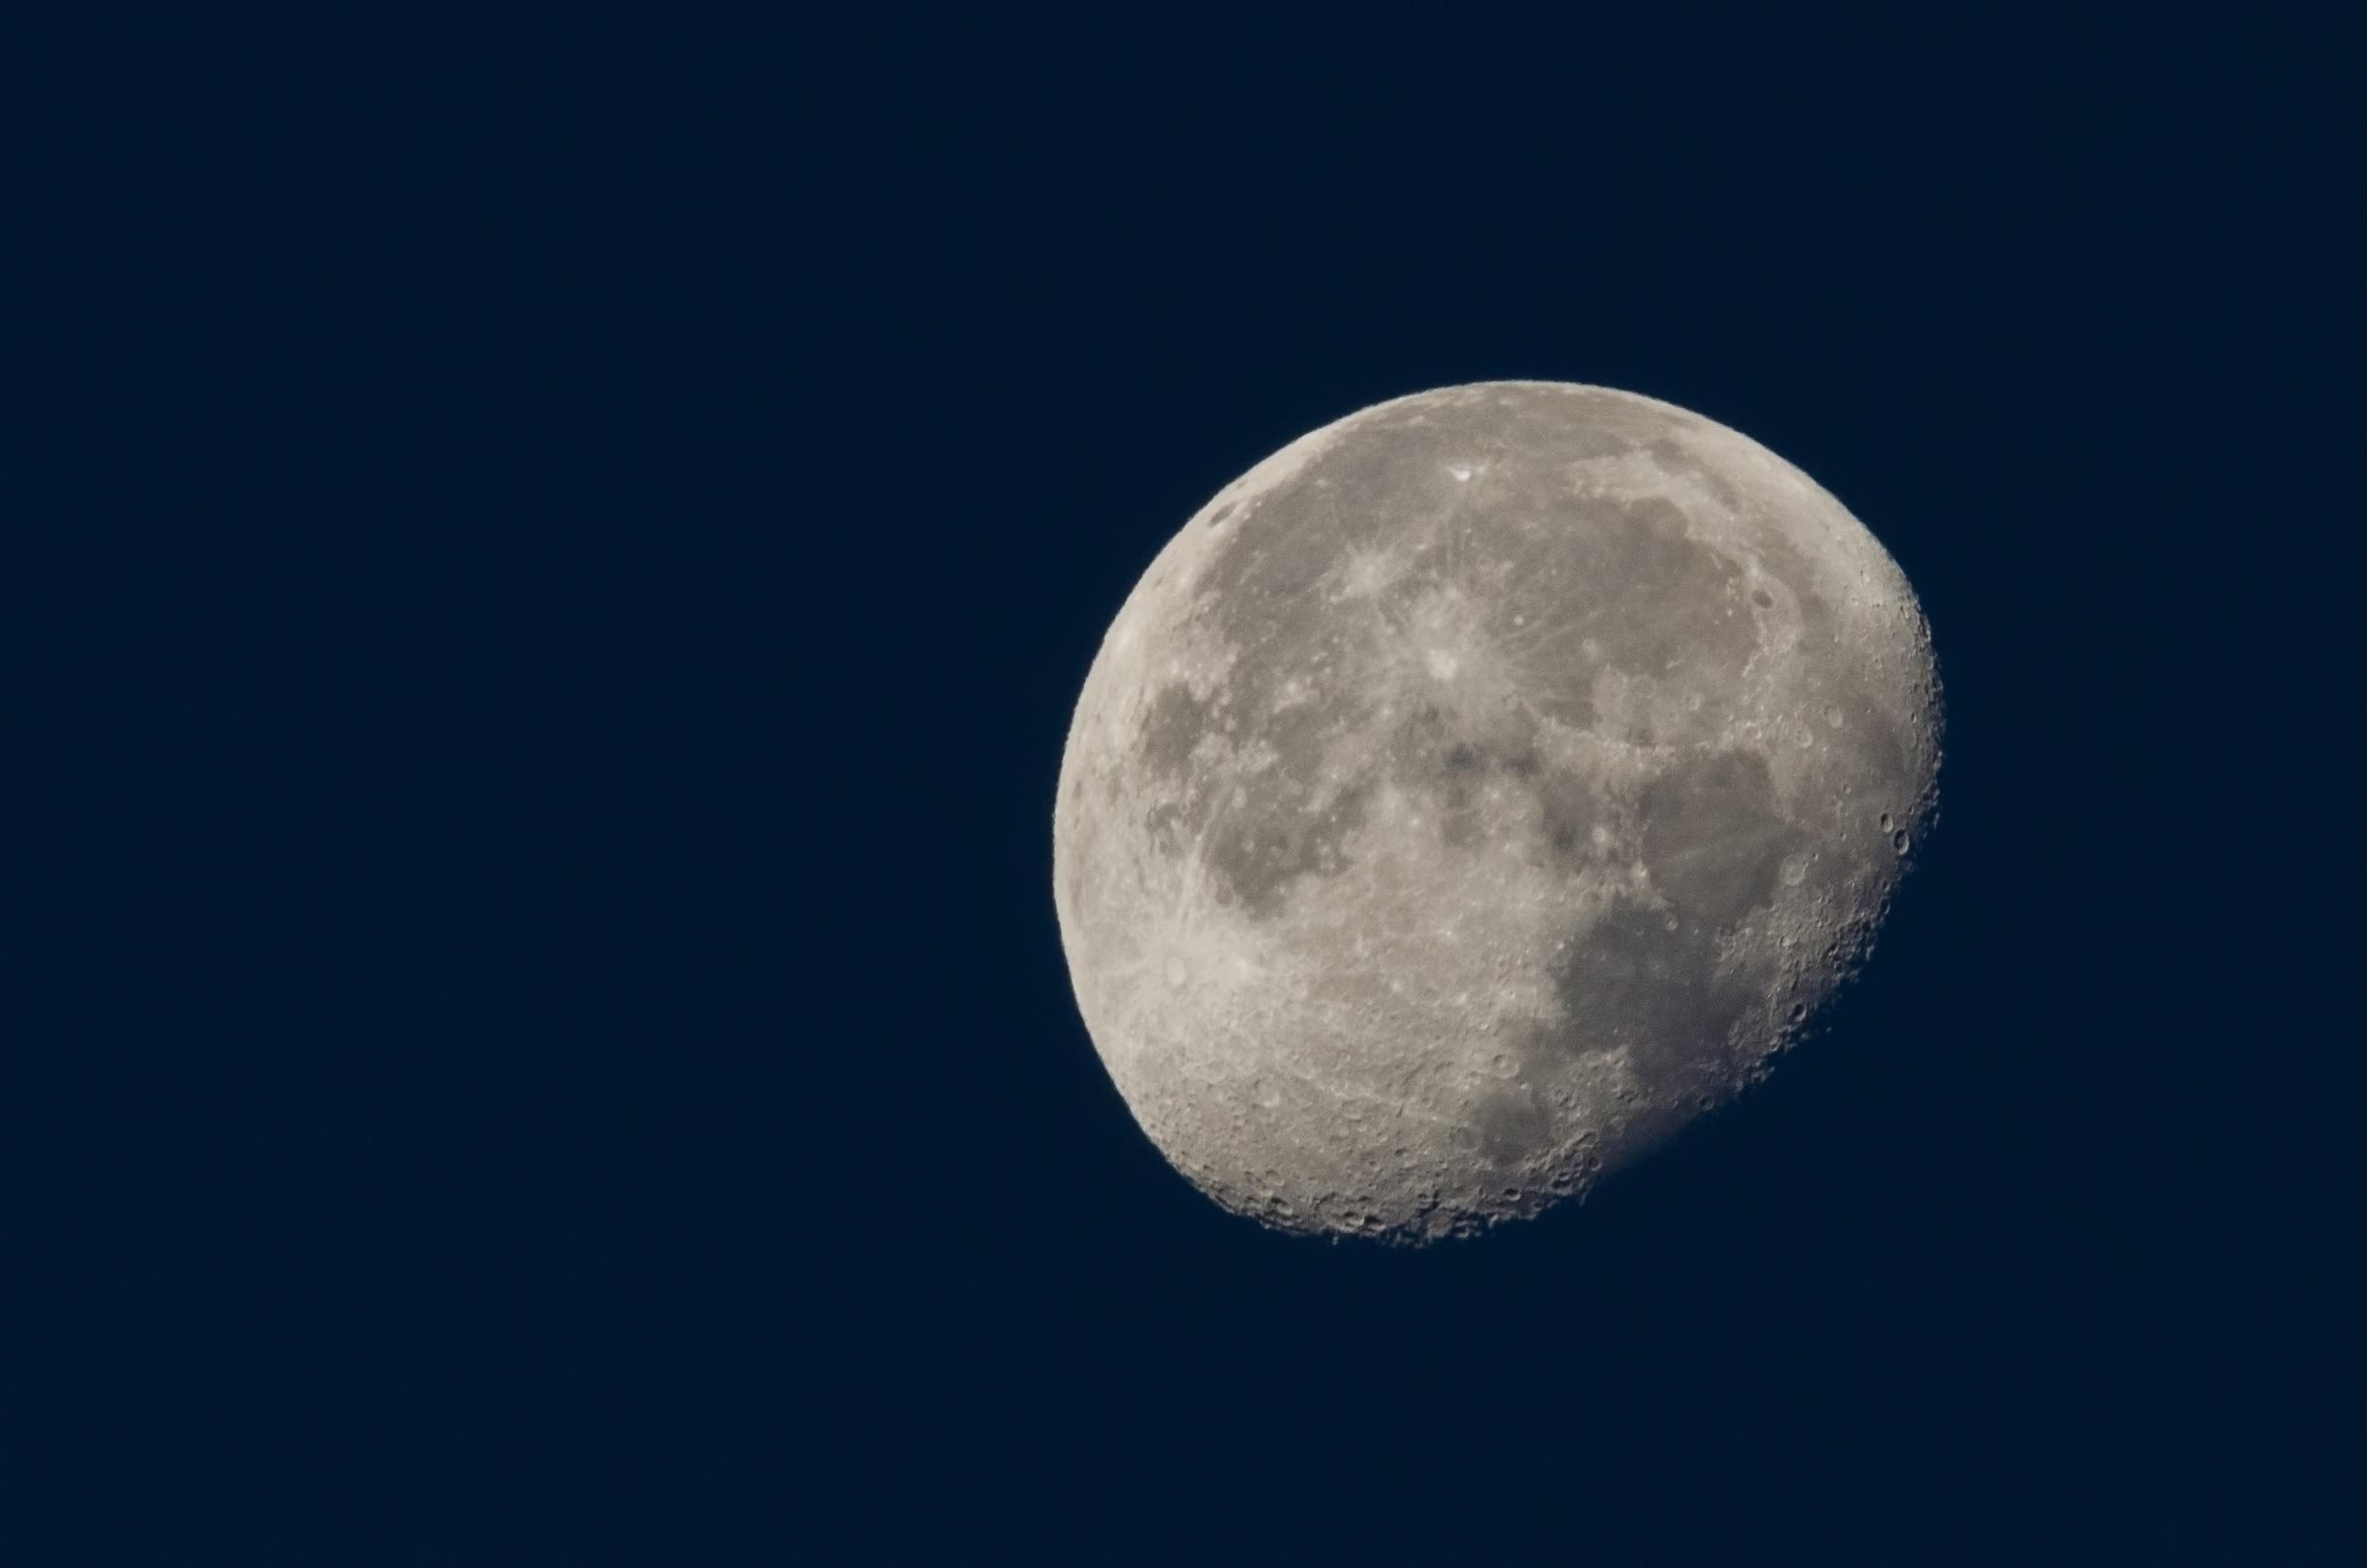 Wannng Moon 10012015  Nikon D7000 ISO 800 600mm f/18 1/250 sec.